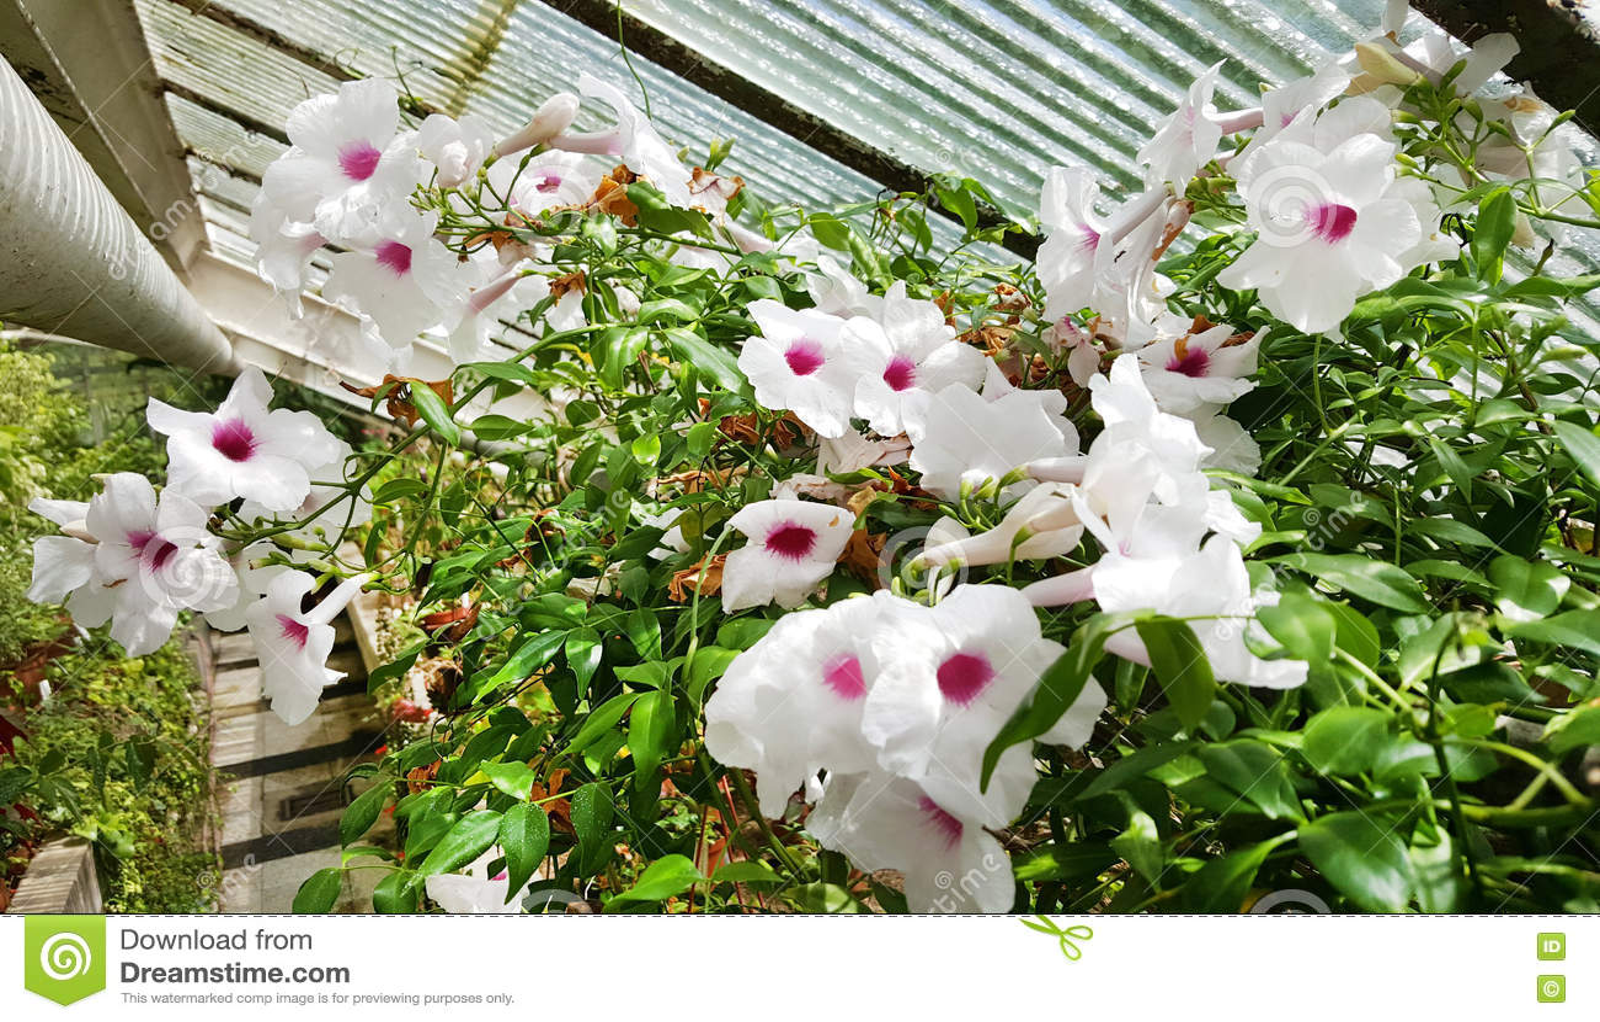 White Begonia Flowers In The Sofia Botanical Garden Stock Image 7025